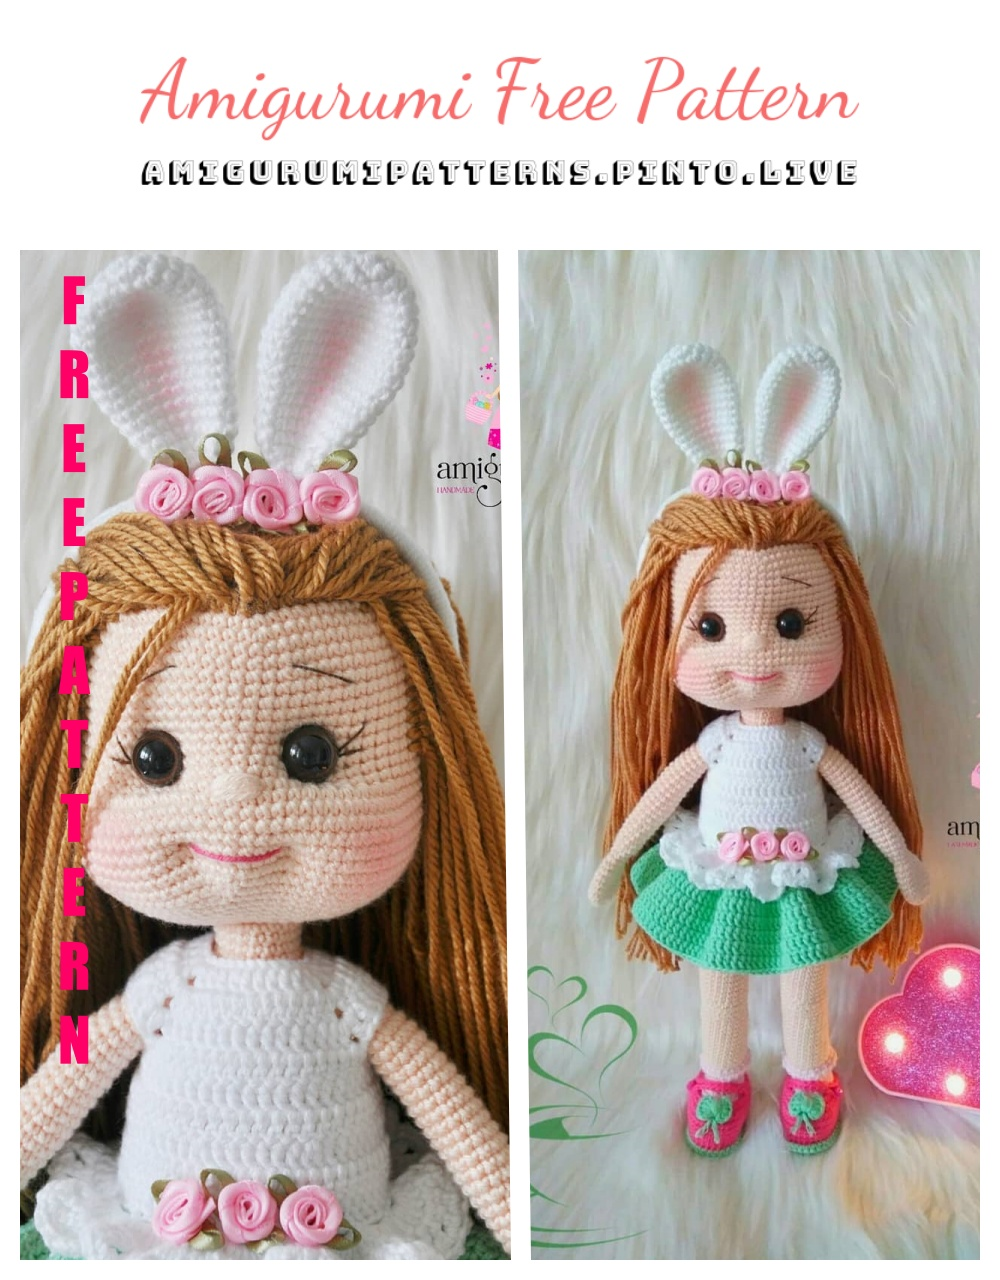 Ateliê Maria Rê - Aprenda a fazer Bonecas de Amigurumi   Facebook   1280x1000